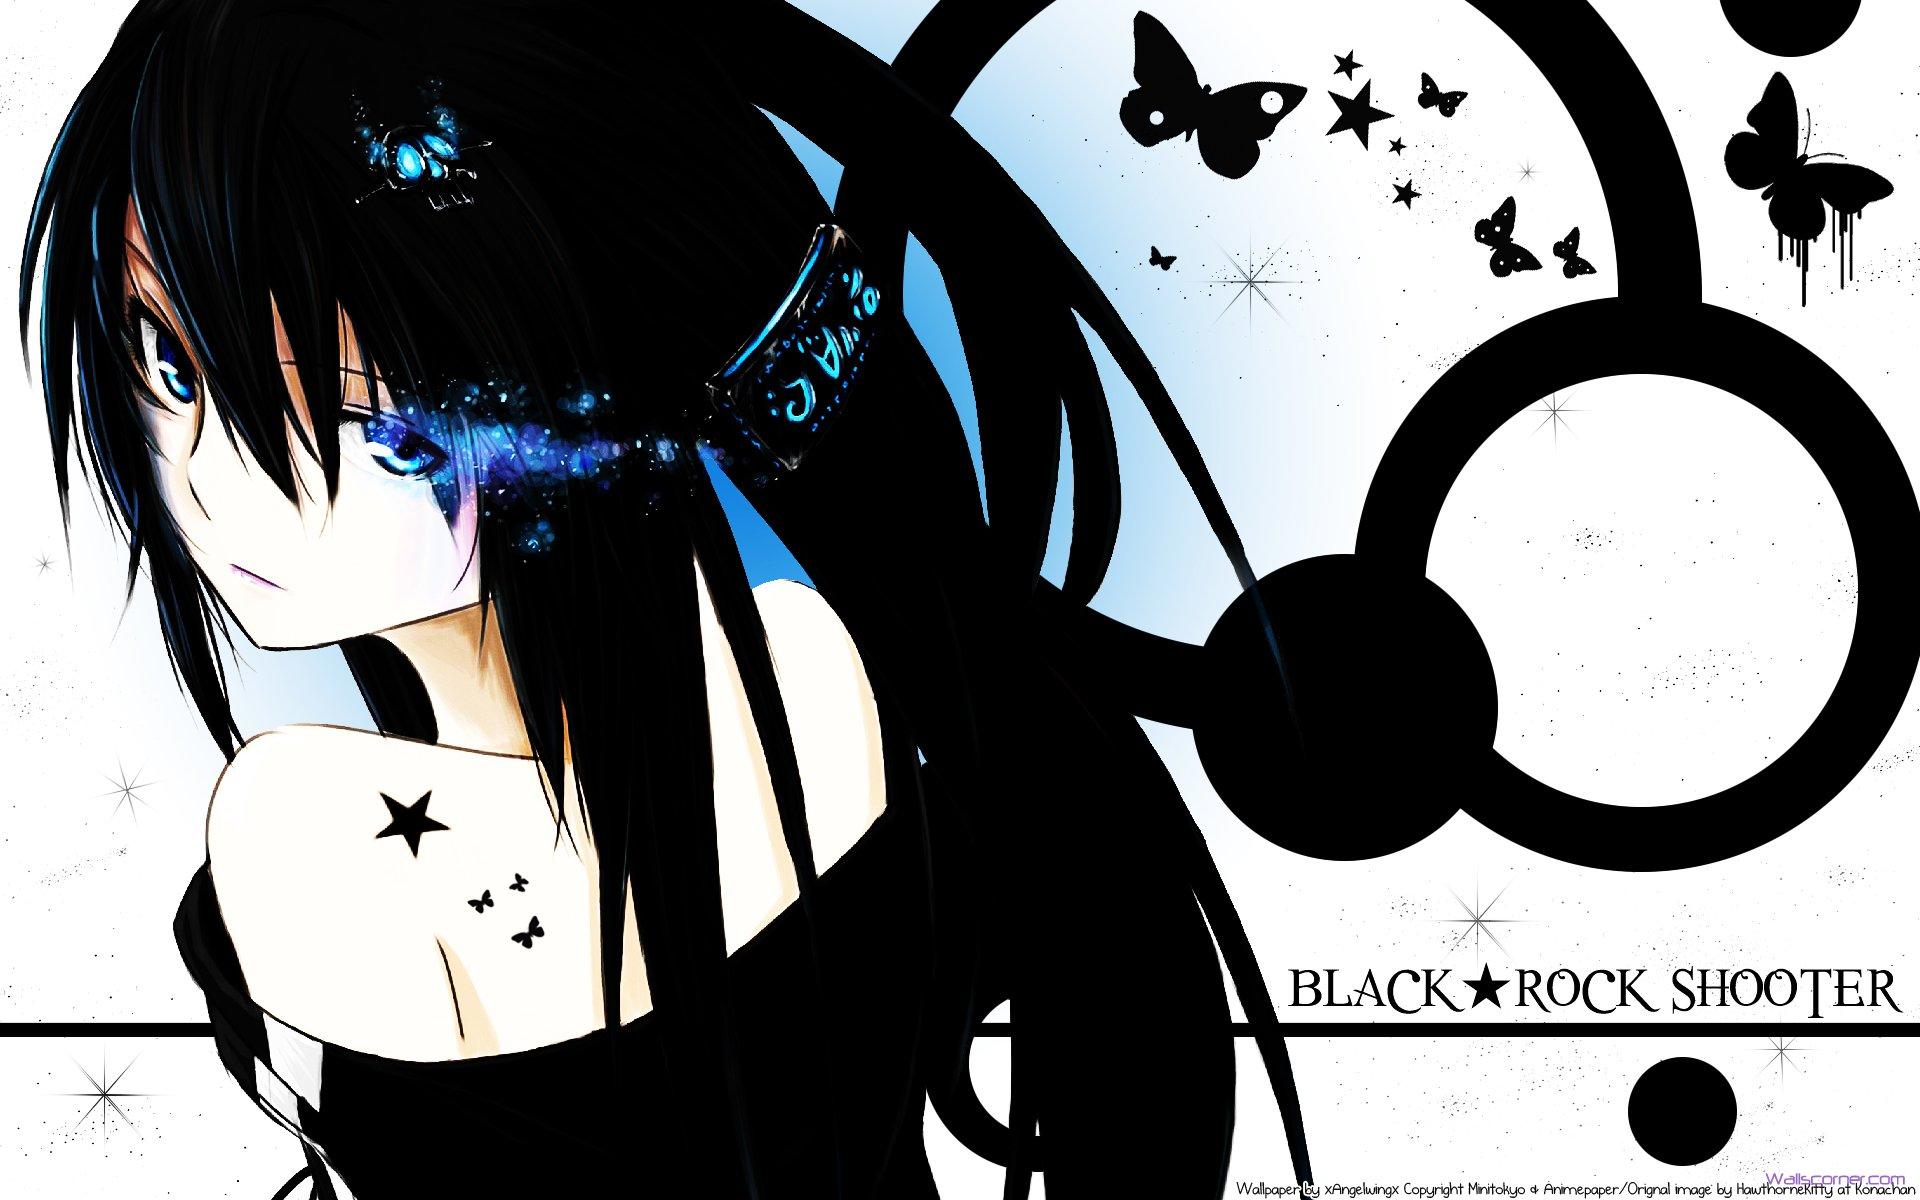 Fullmetal Alchemist Anime Wallpaper  Fanpop Image Animegirlblackrockshooter Jpg Cardfight Vanguard Wiki